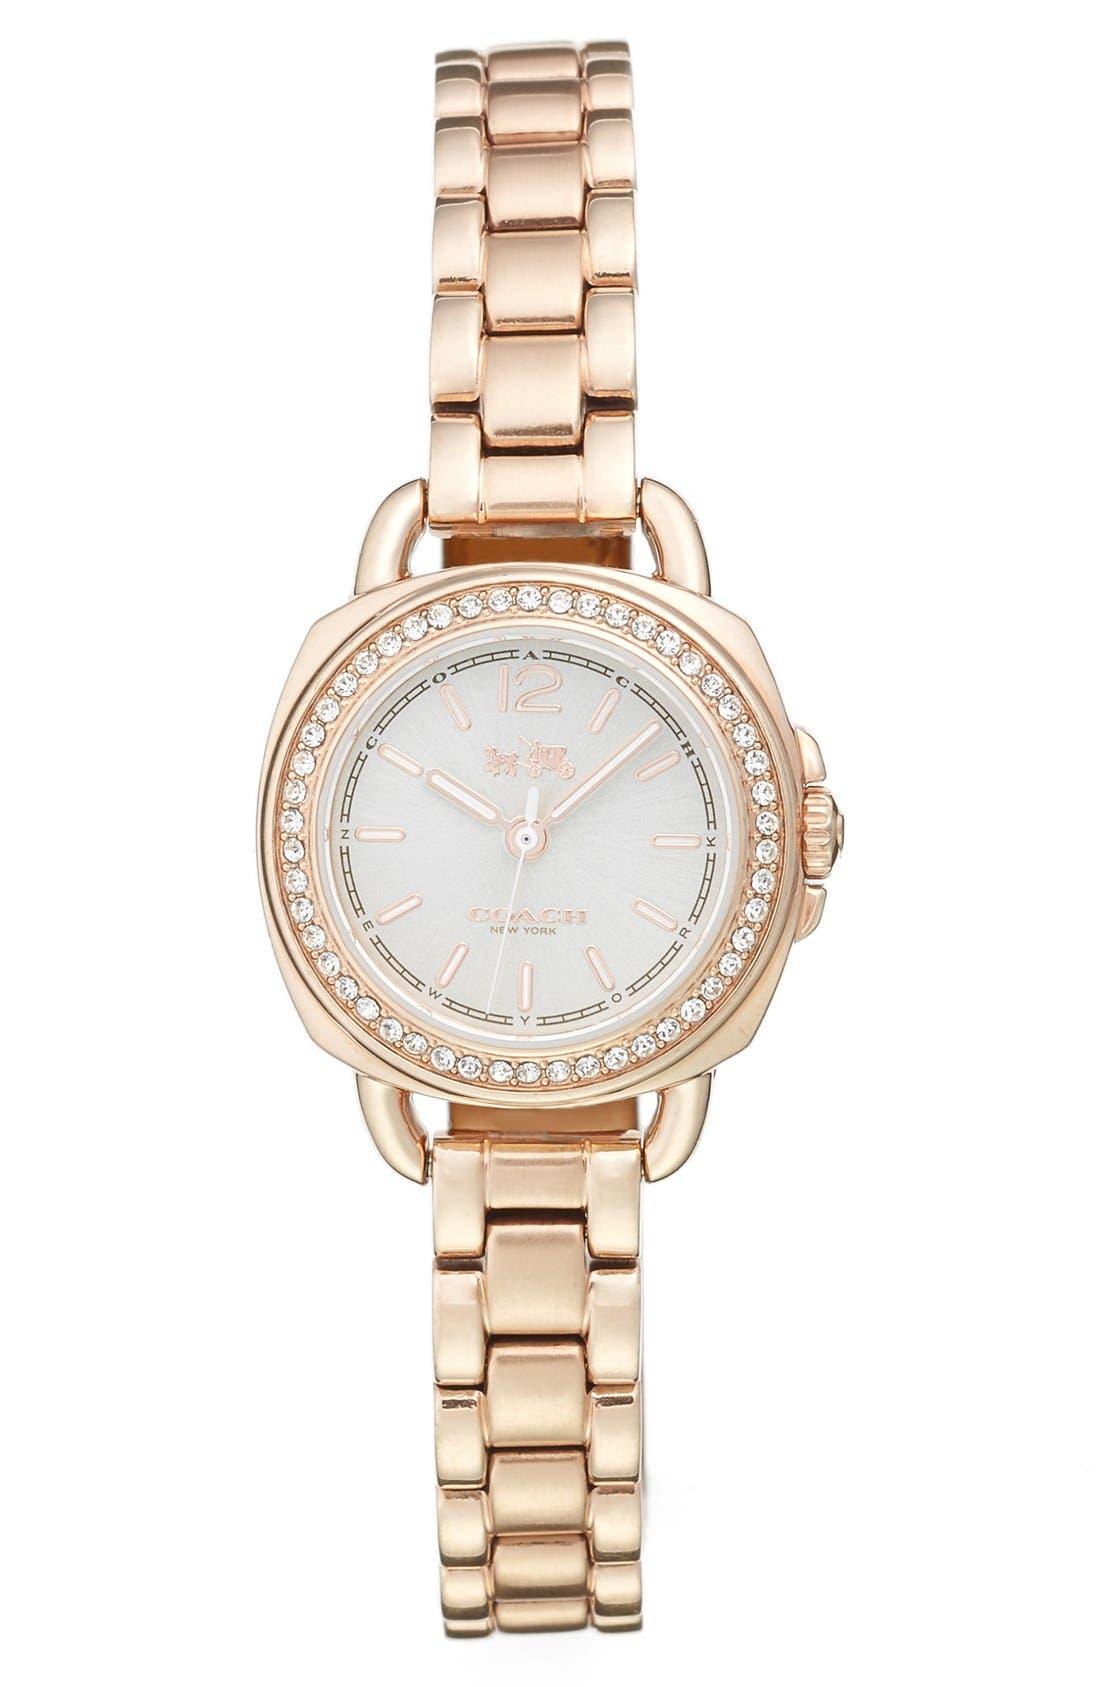 COACH Tatum Crystal Bezel Bracelet Watch, 24mm